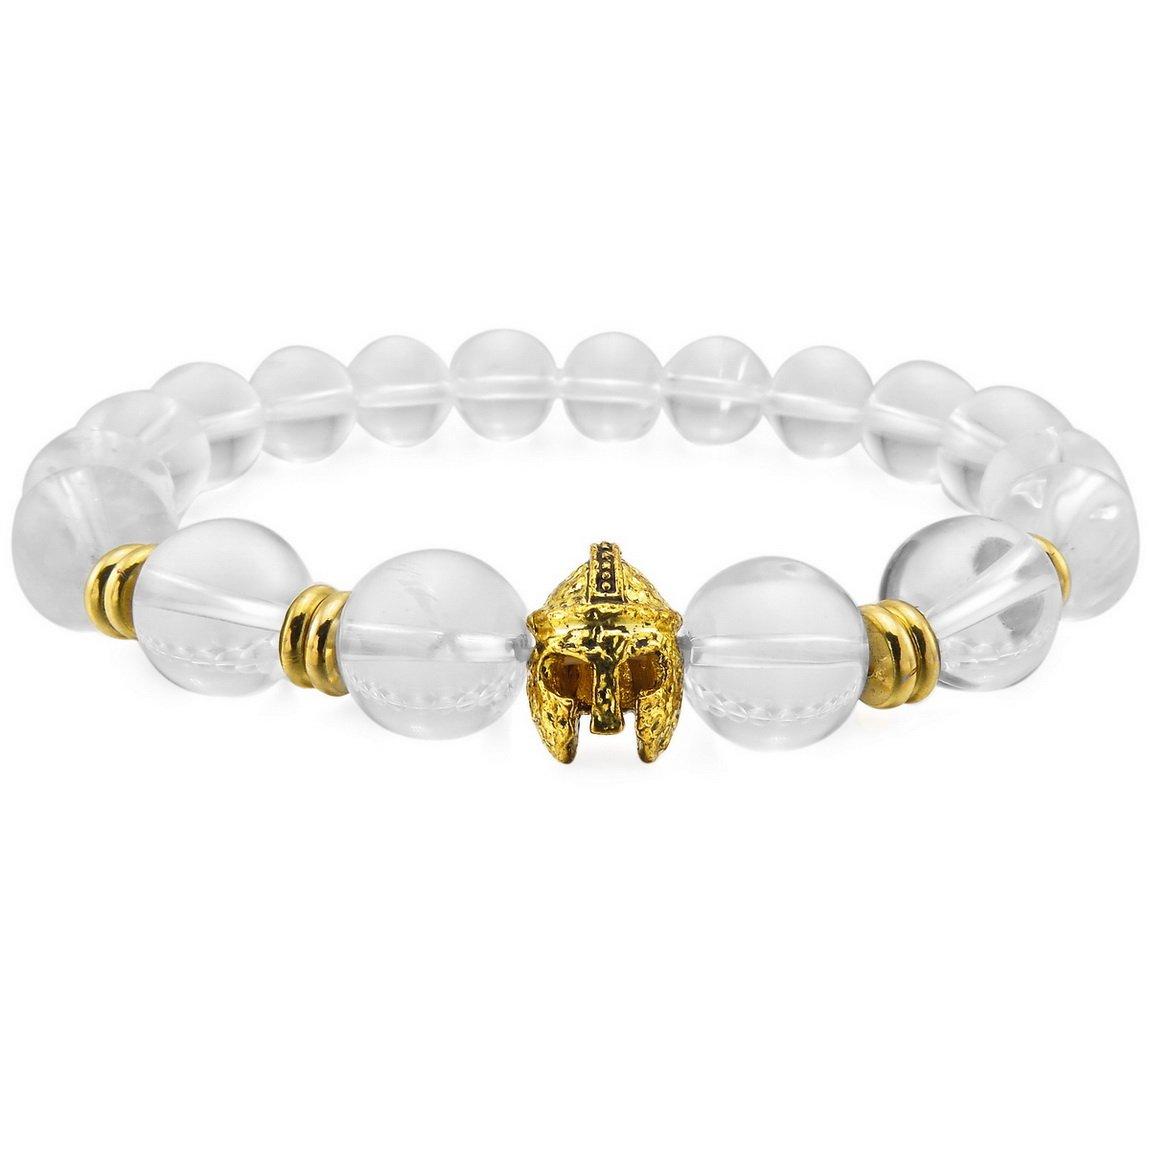 INBLUE Men,Women's 12mm Alloy Energy Bracelet Wrist Link Energy Stone Gold Tone Buddha Mala Bead Helmet Elastic INBLUE Jewelry mnb1411-12.0